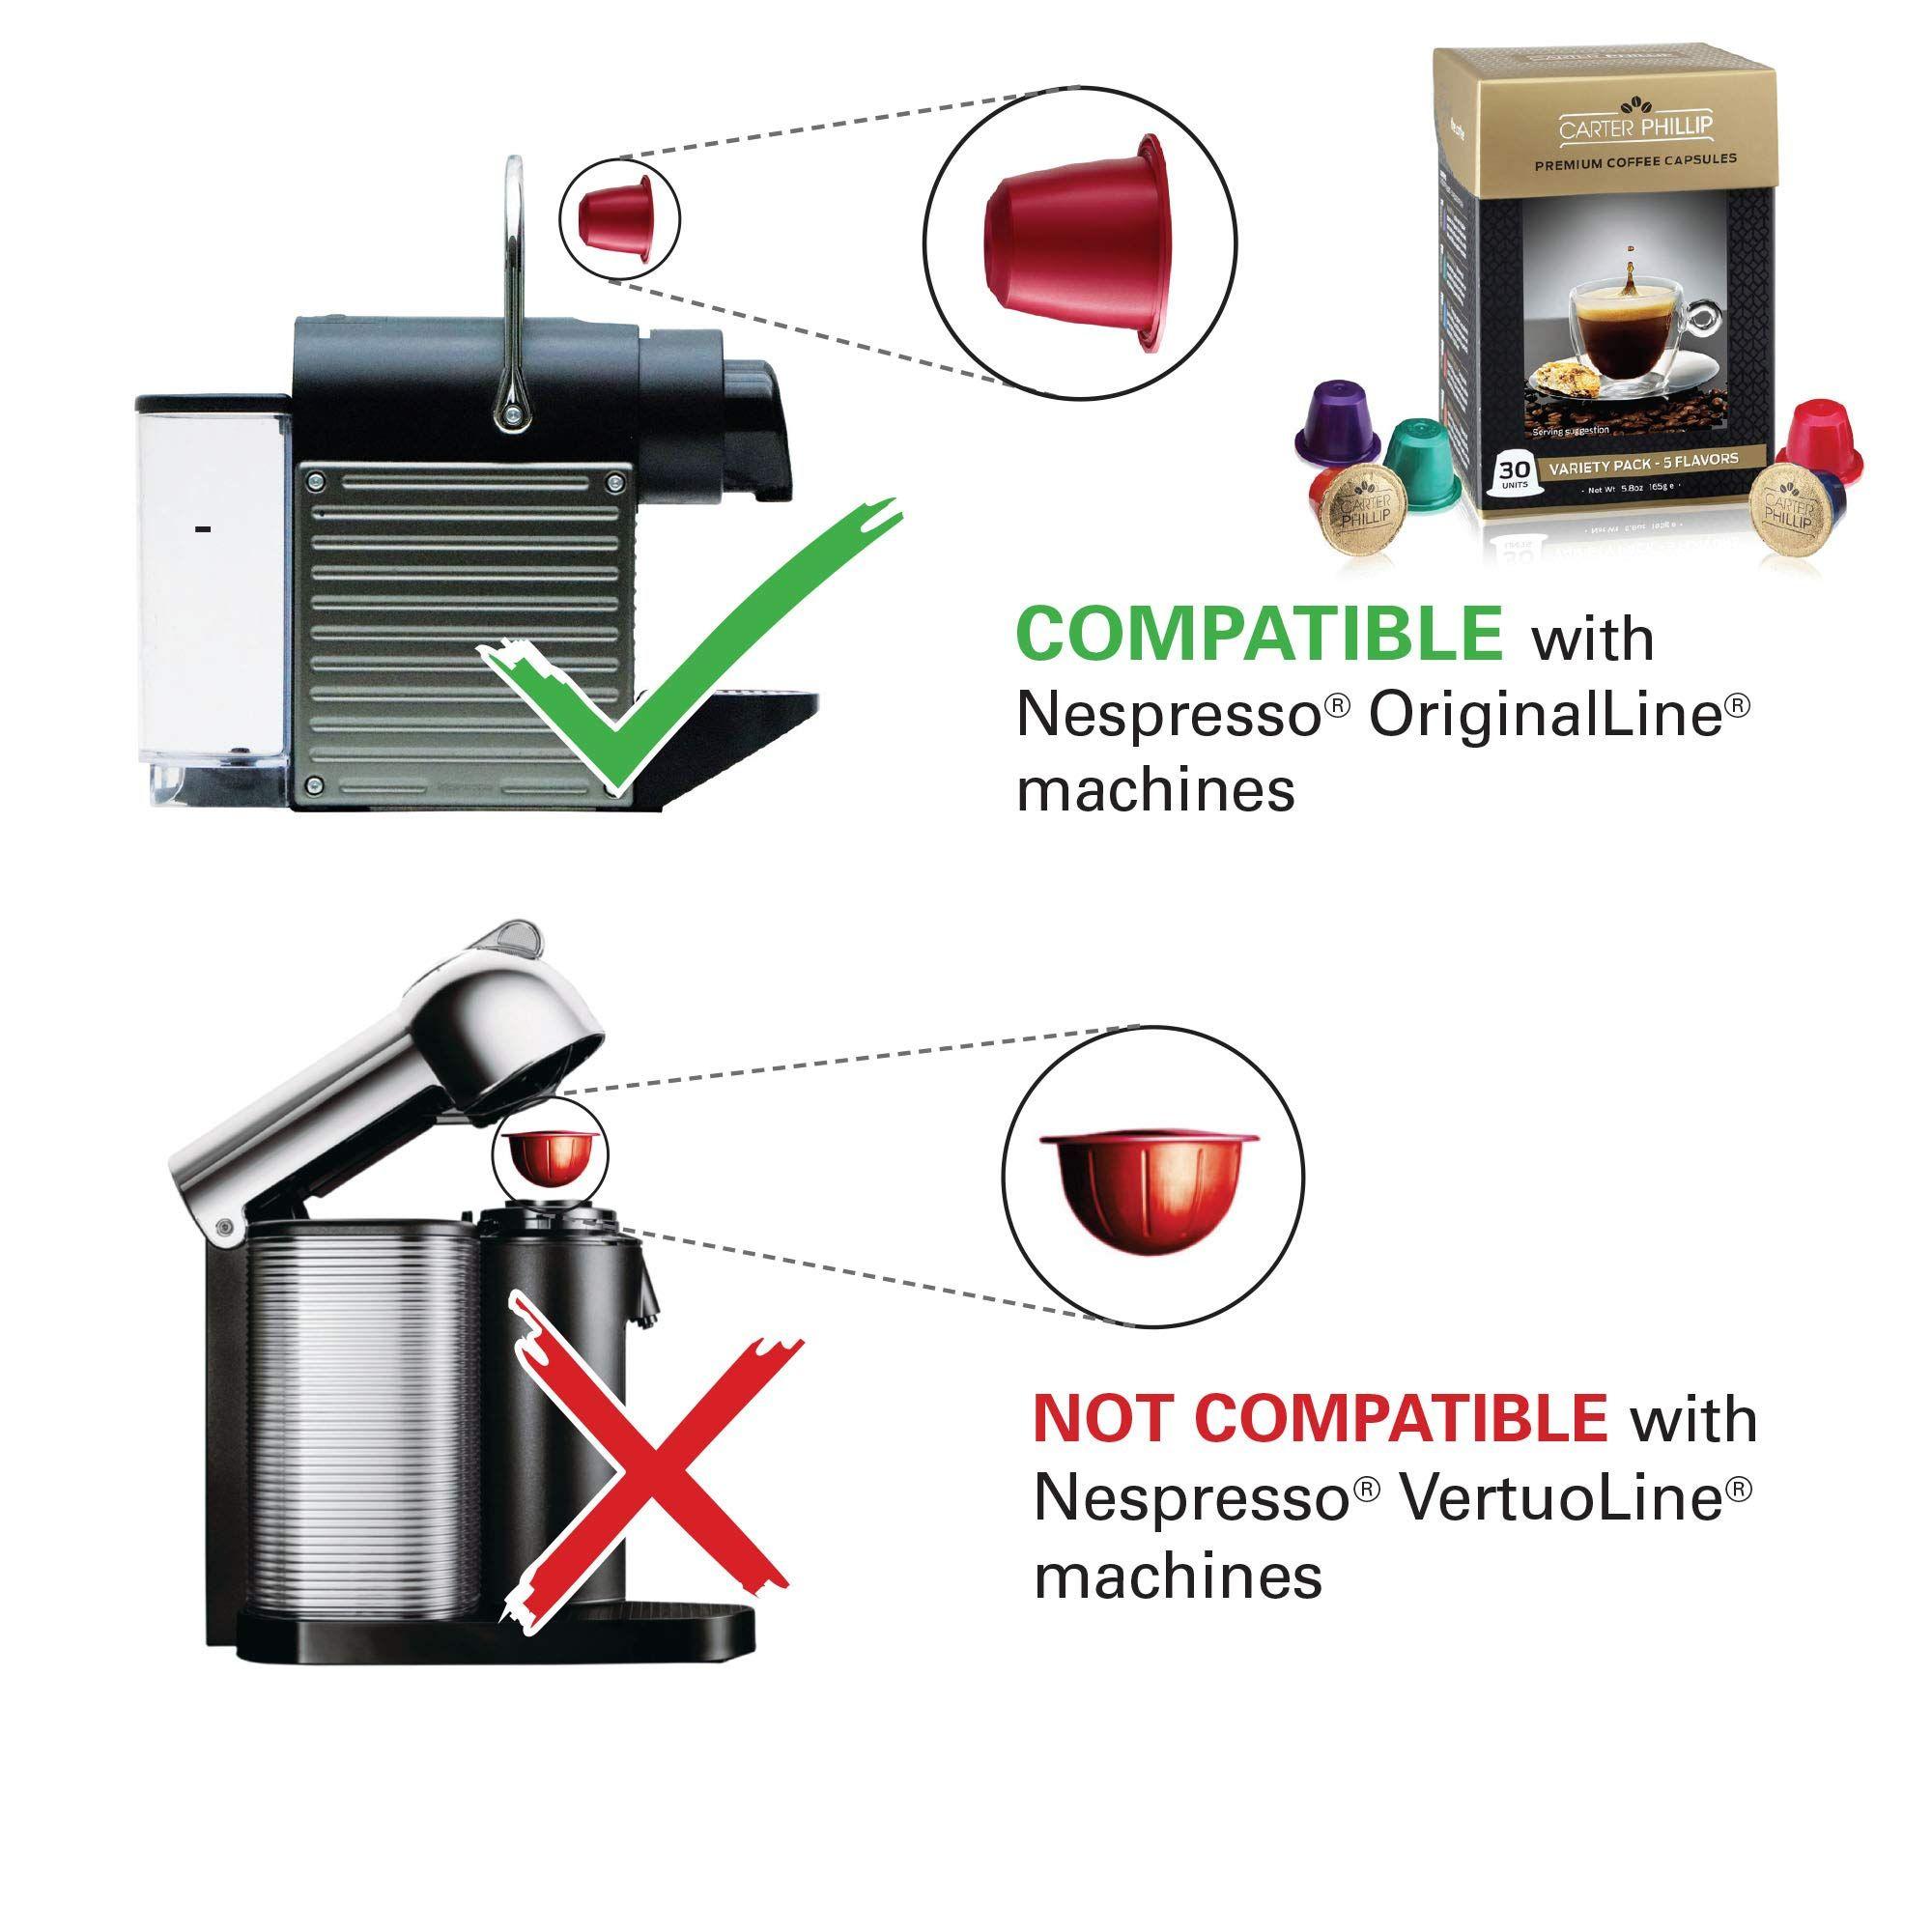 Espresso capsules compatible with nespresso originalline